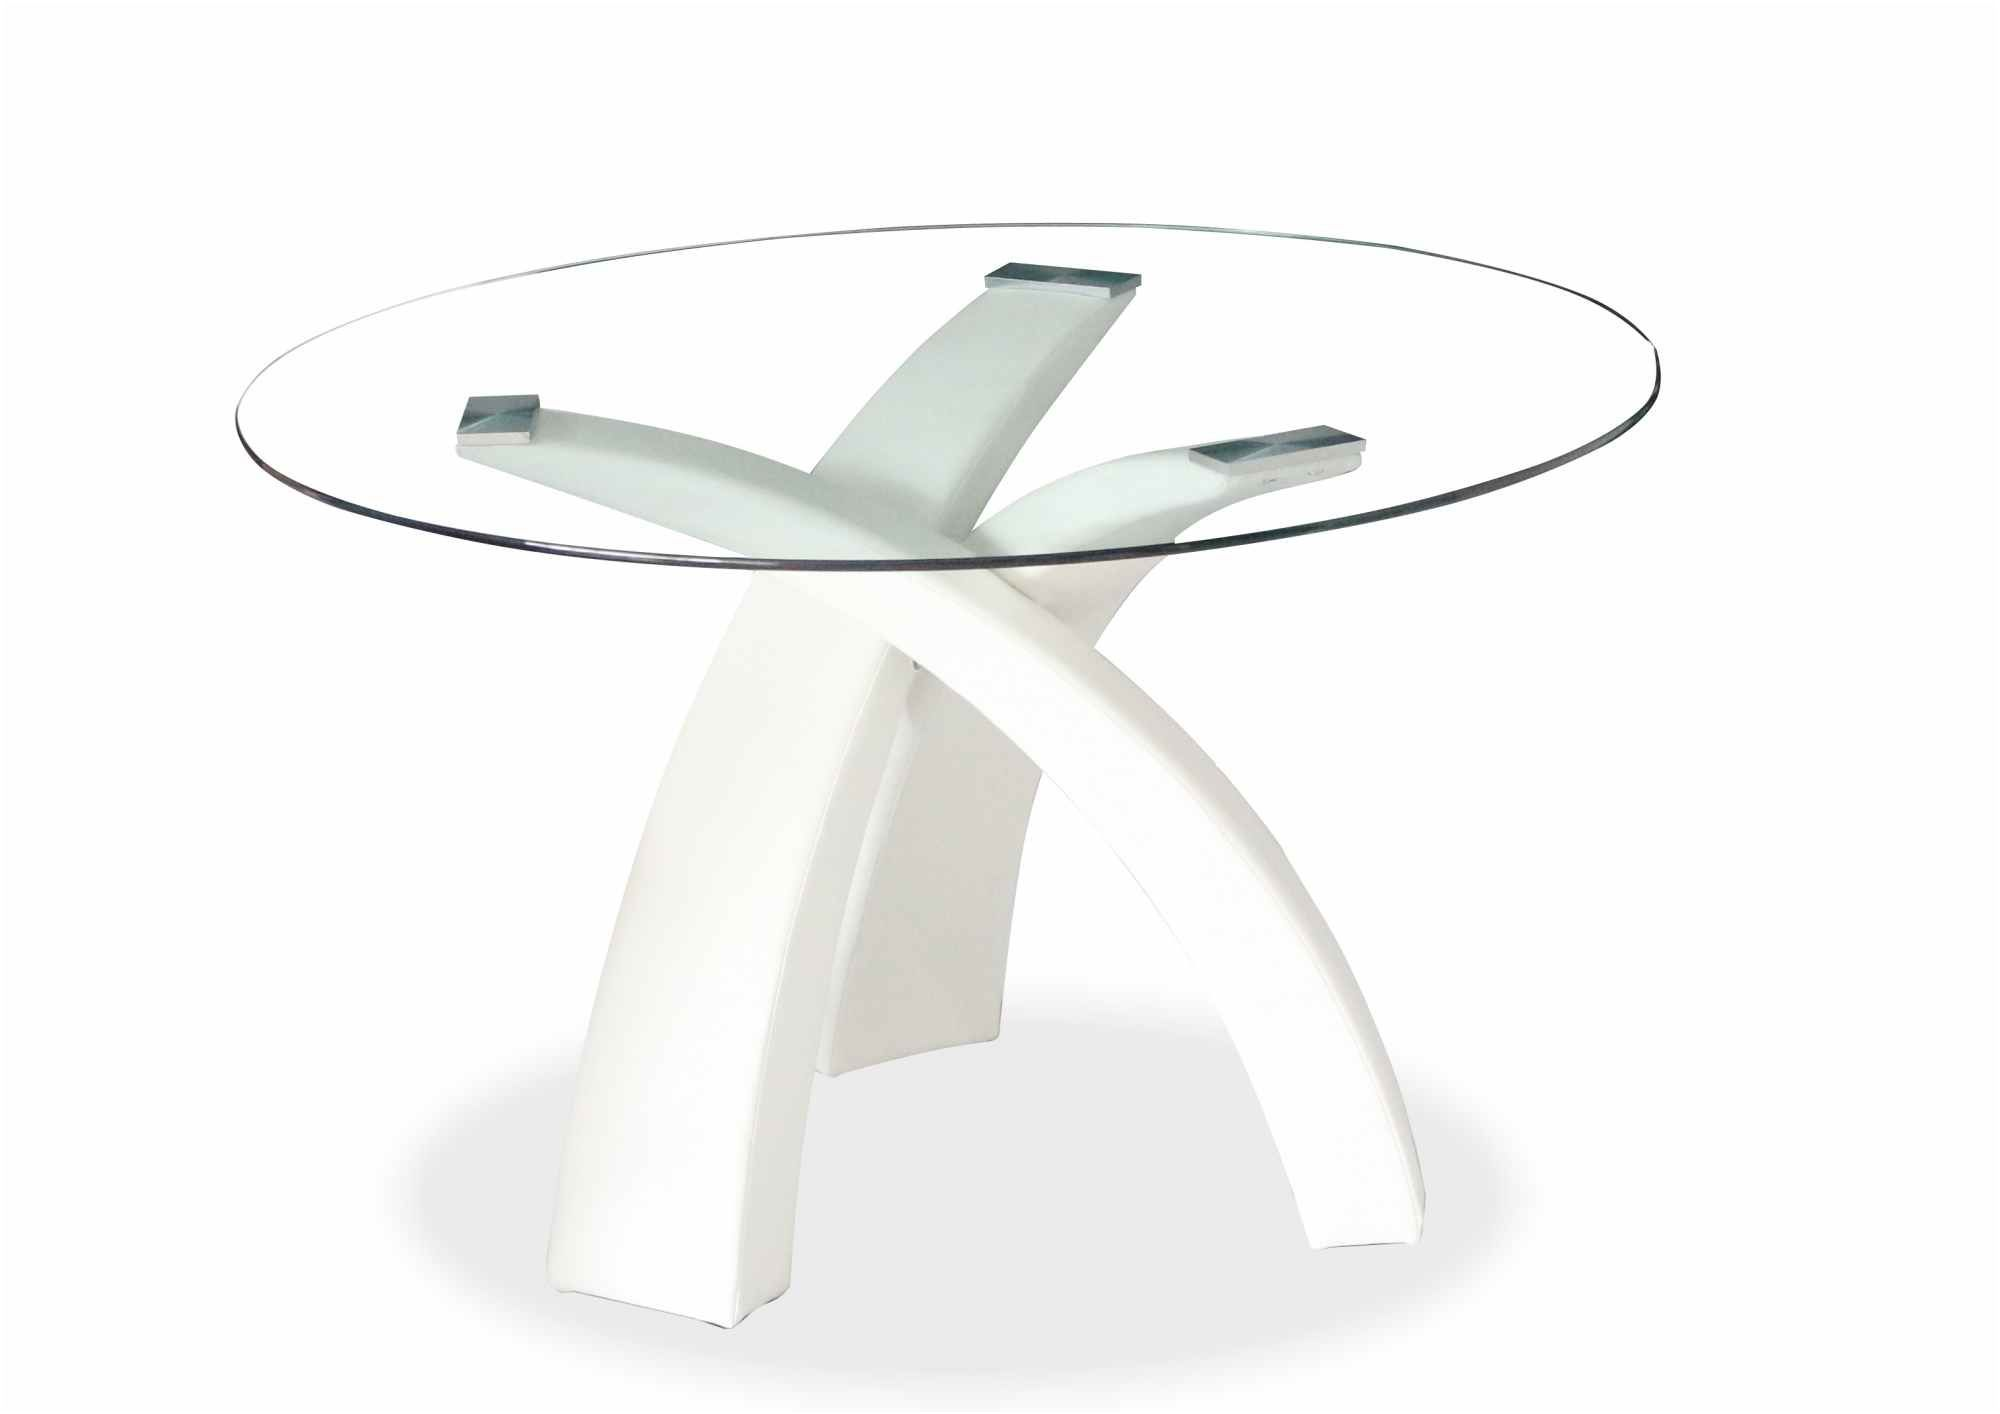 13 Creatif Table A Manger Ronde Ikea Pictures Dengan Gambar